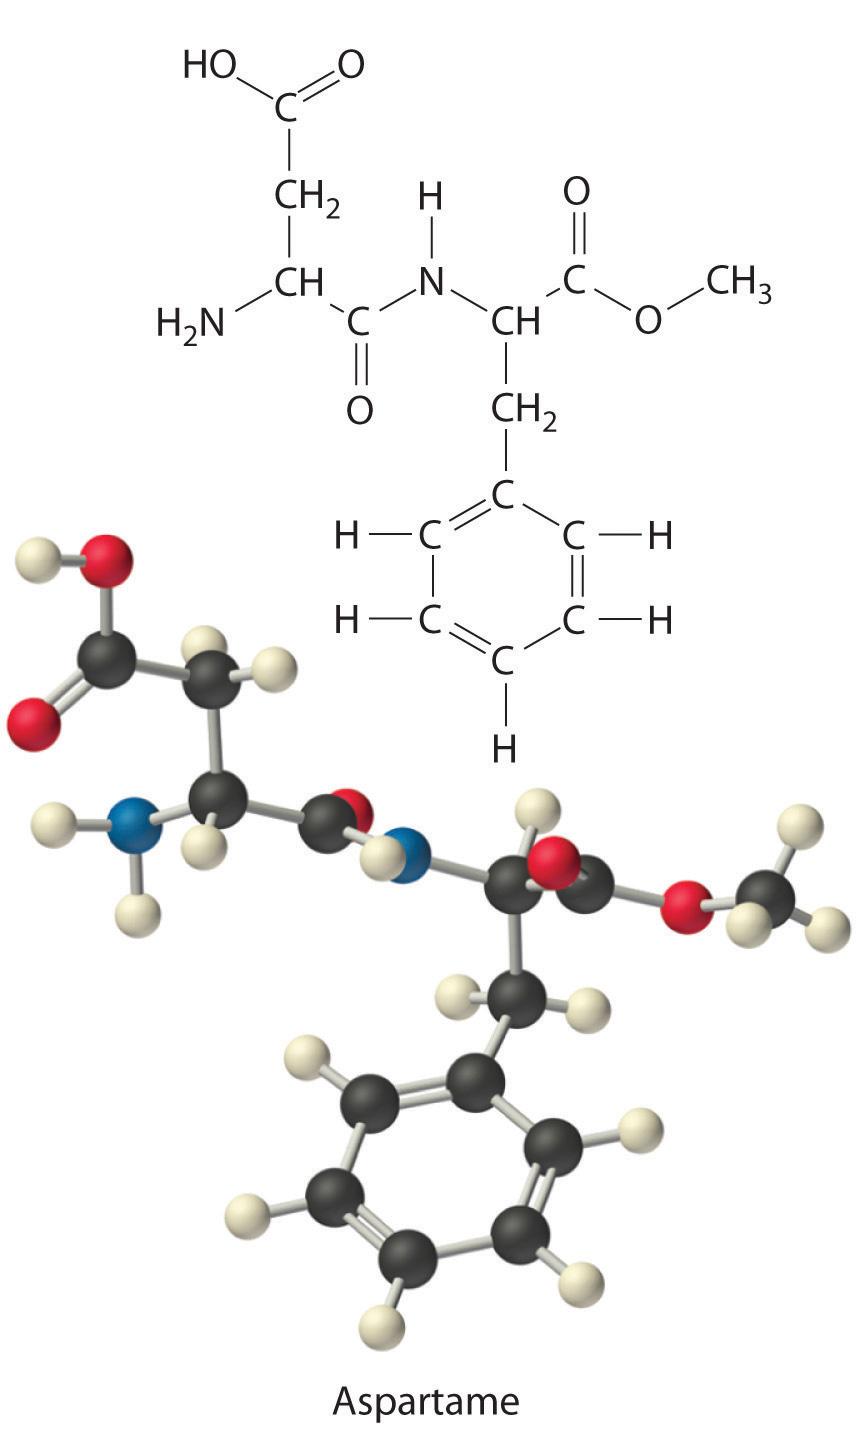 molar mass of sucrose Molecular weight of c12h22o11: (12 c) (12 g/mole) + (22 h) (1 g/mole) + (11 o)  (16 g/mole) = 342 g/mole using avogadro's number, the.